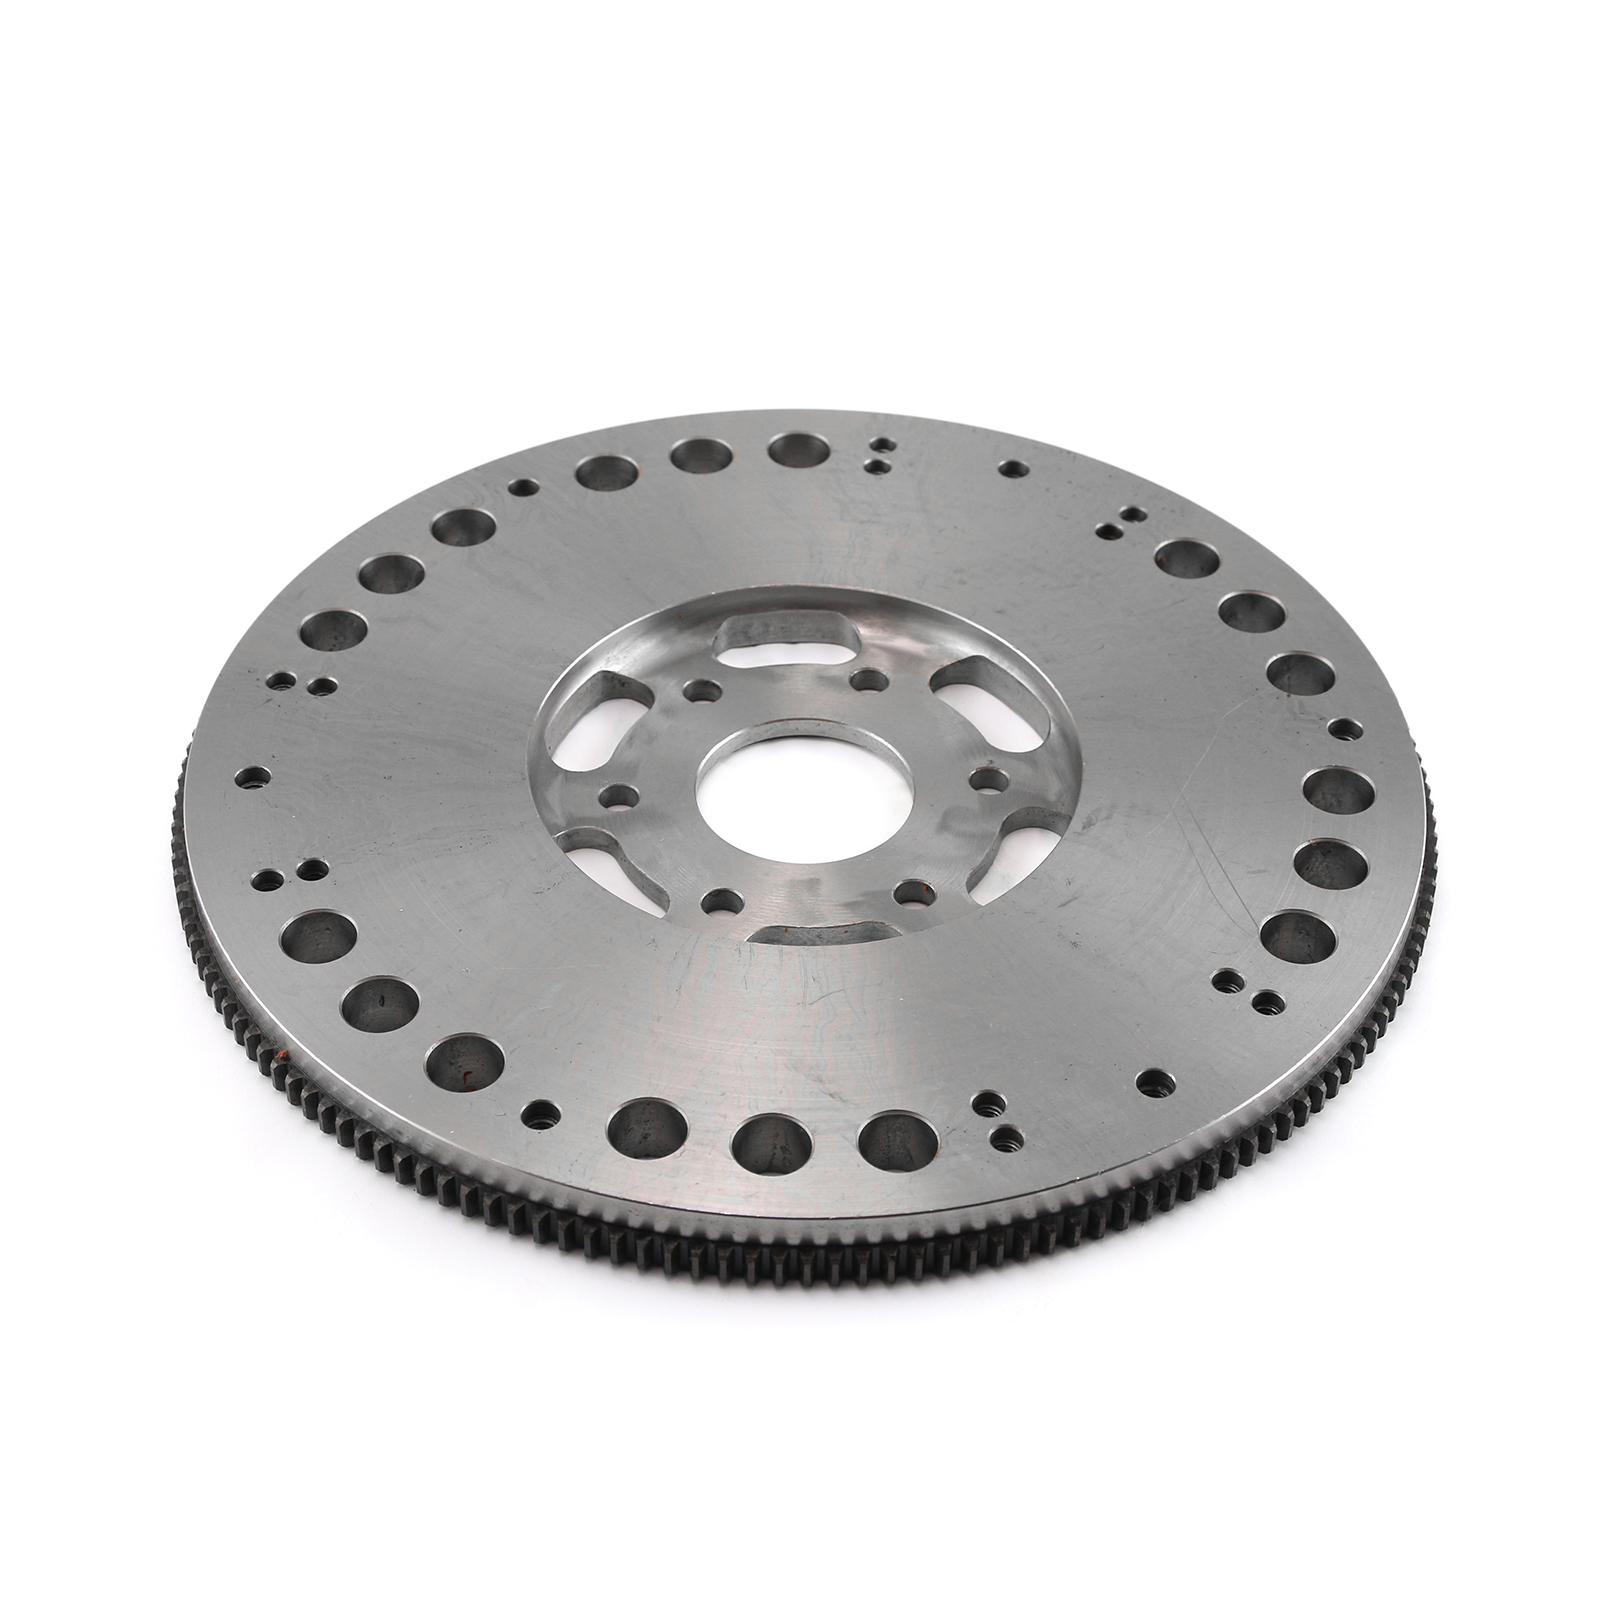 Ford 429 460 164 Tooth Billet Steel Light SFI Flywheel Internal External